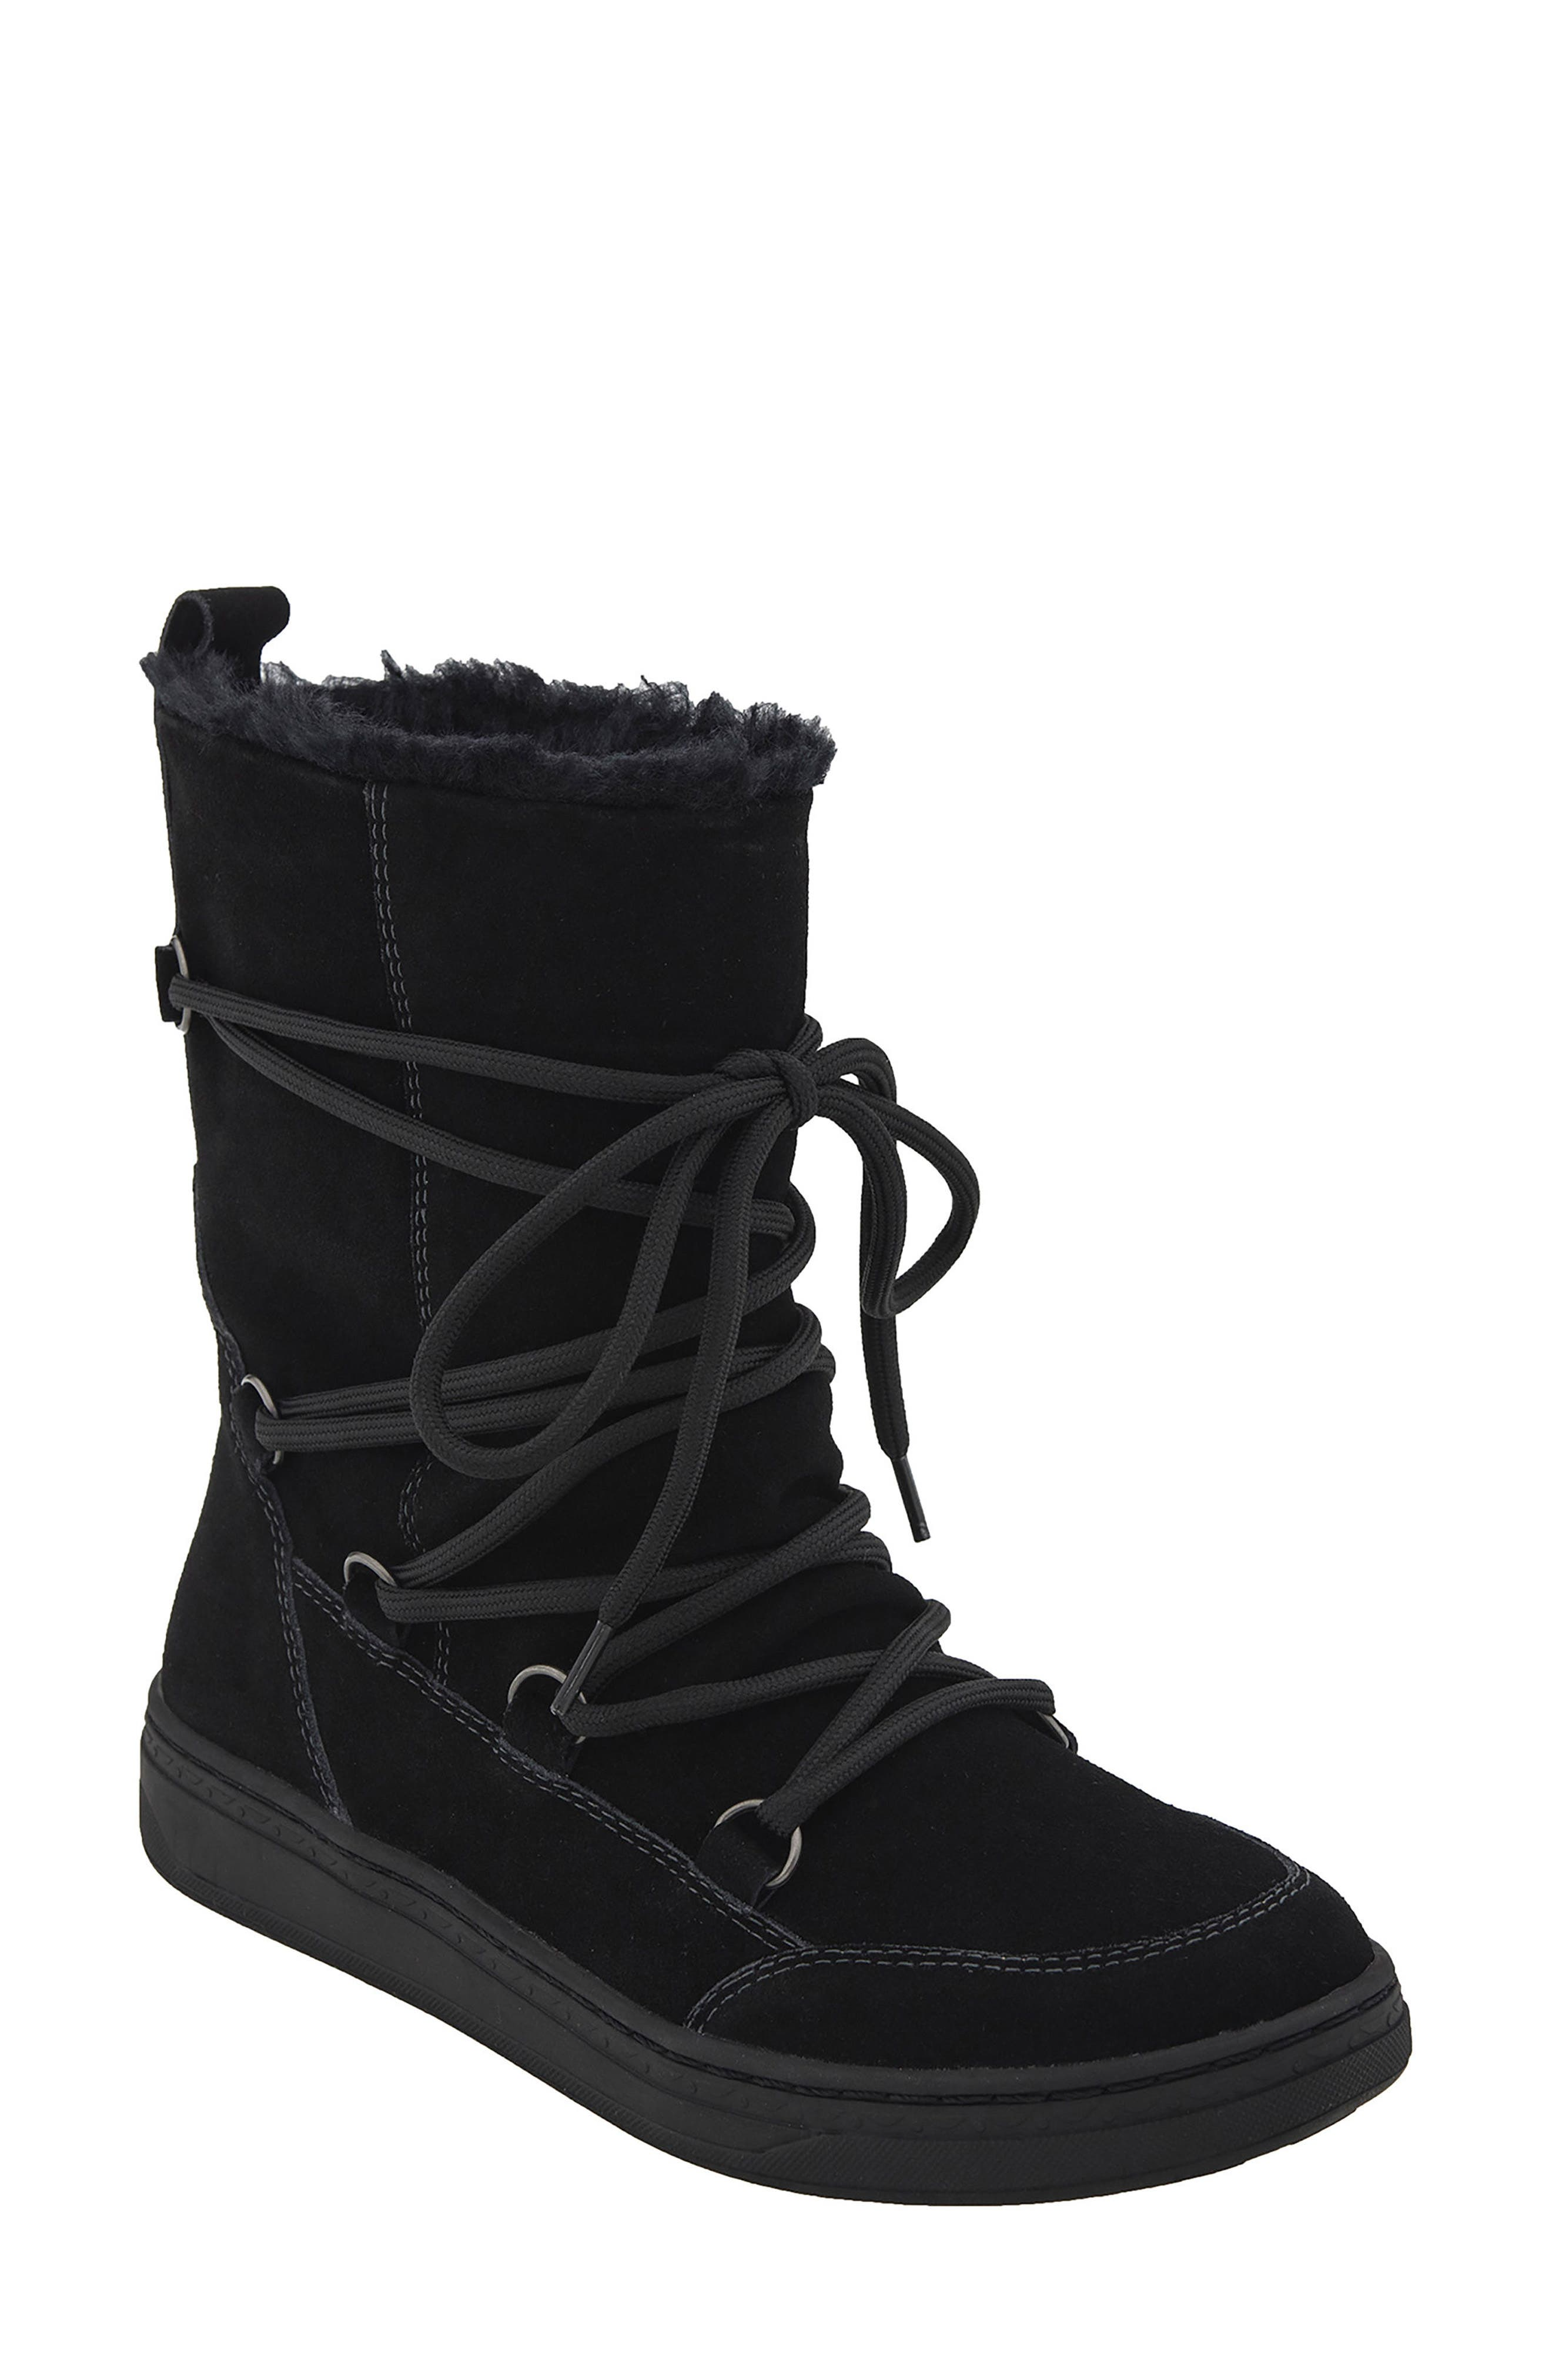 Zodiac Water Resistant Boot,                             Main thumbnail 1, color,                             Black Suede